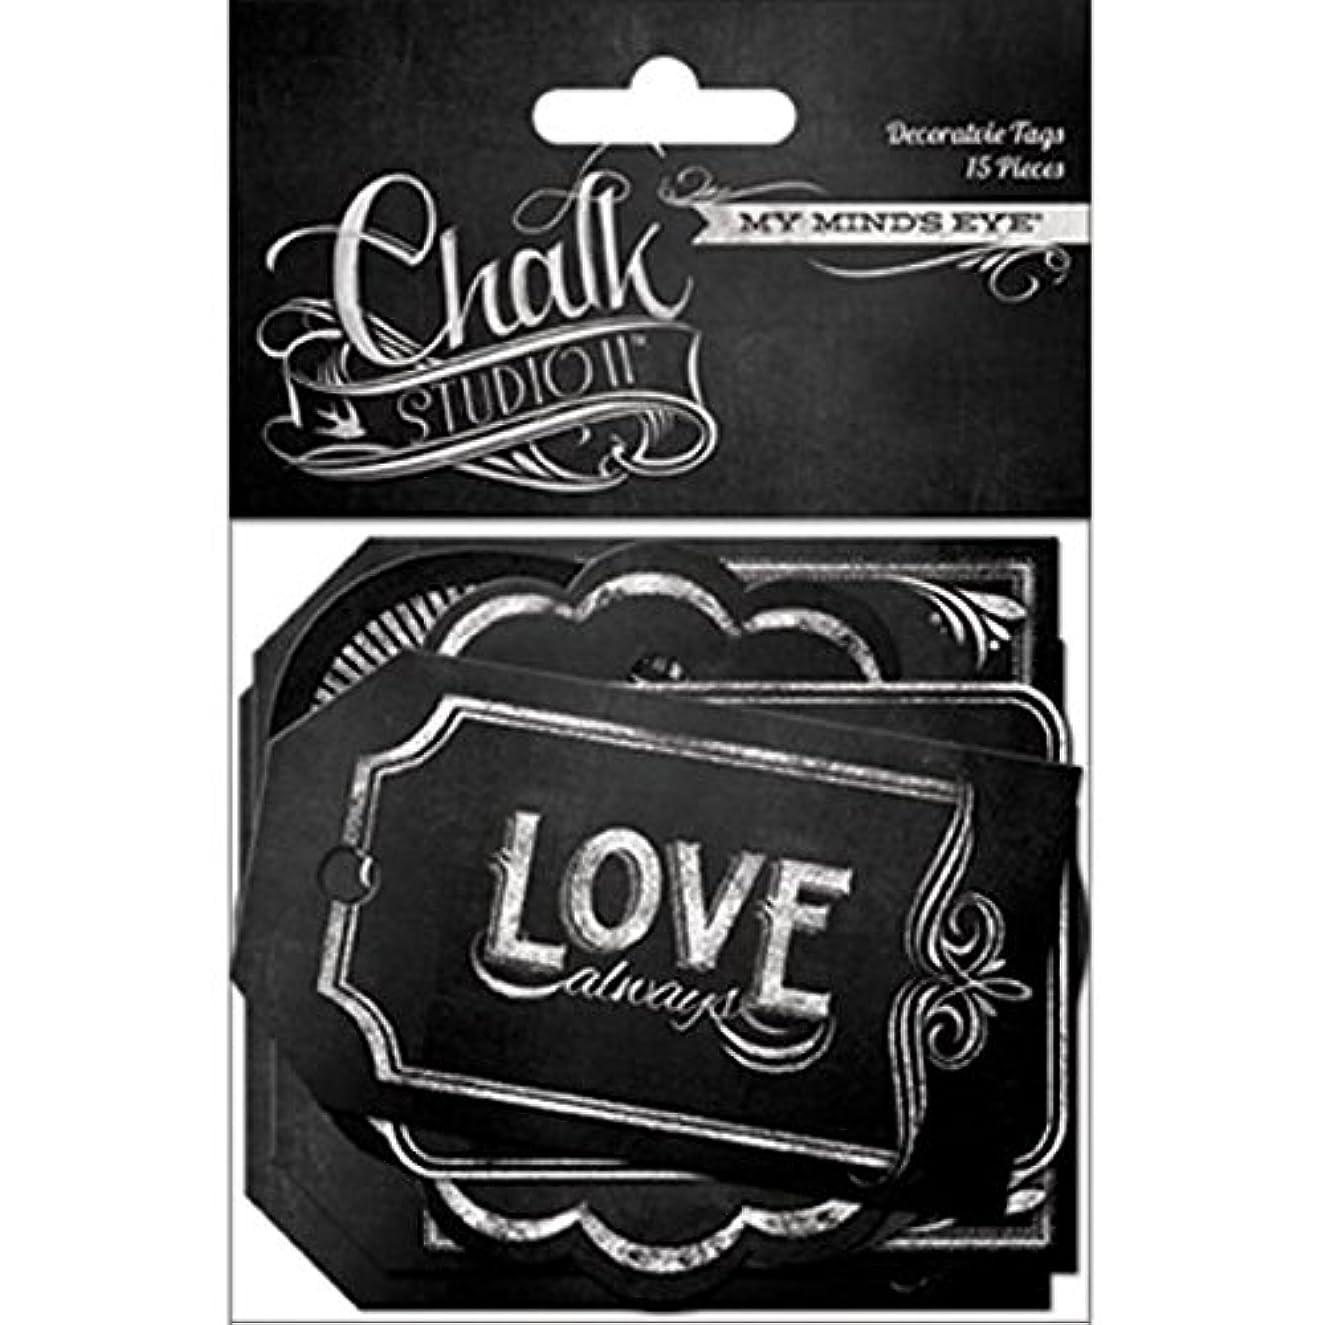 My Mind's Eye Chalk Studio 2 Decorative Tags